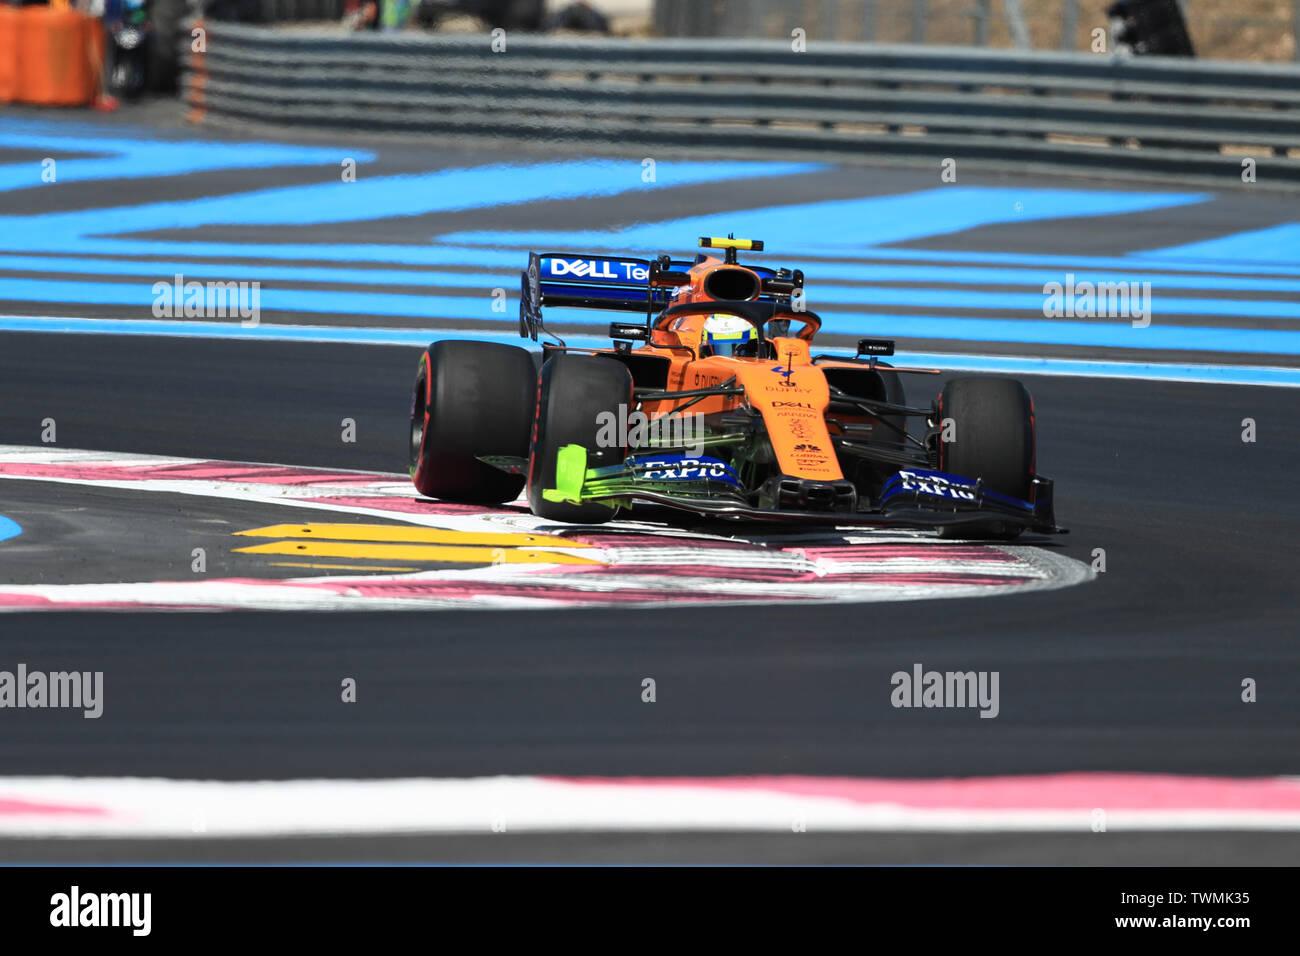 Marseille, France. 21st Jun 2019. FIA Formula 1 Grand Prix of France, practice sessions; McLaren, Lando Norris Credit: Action Plus Sports Images/Alamy Live News Stock Photo